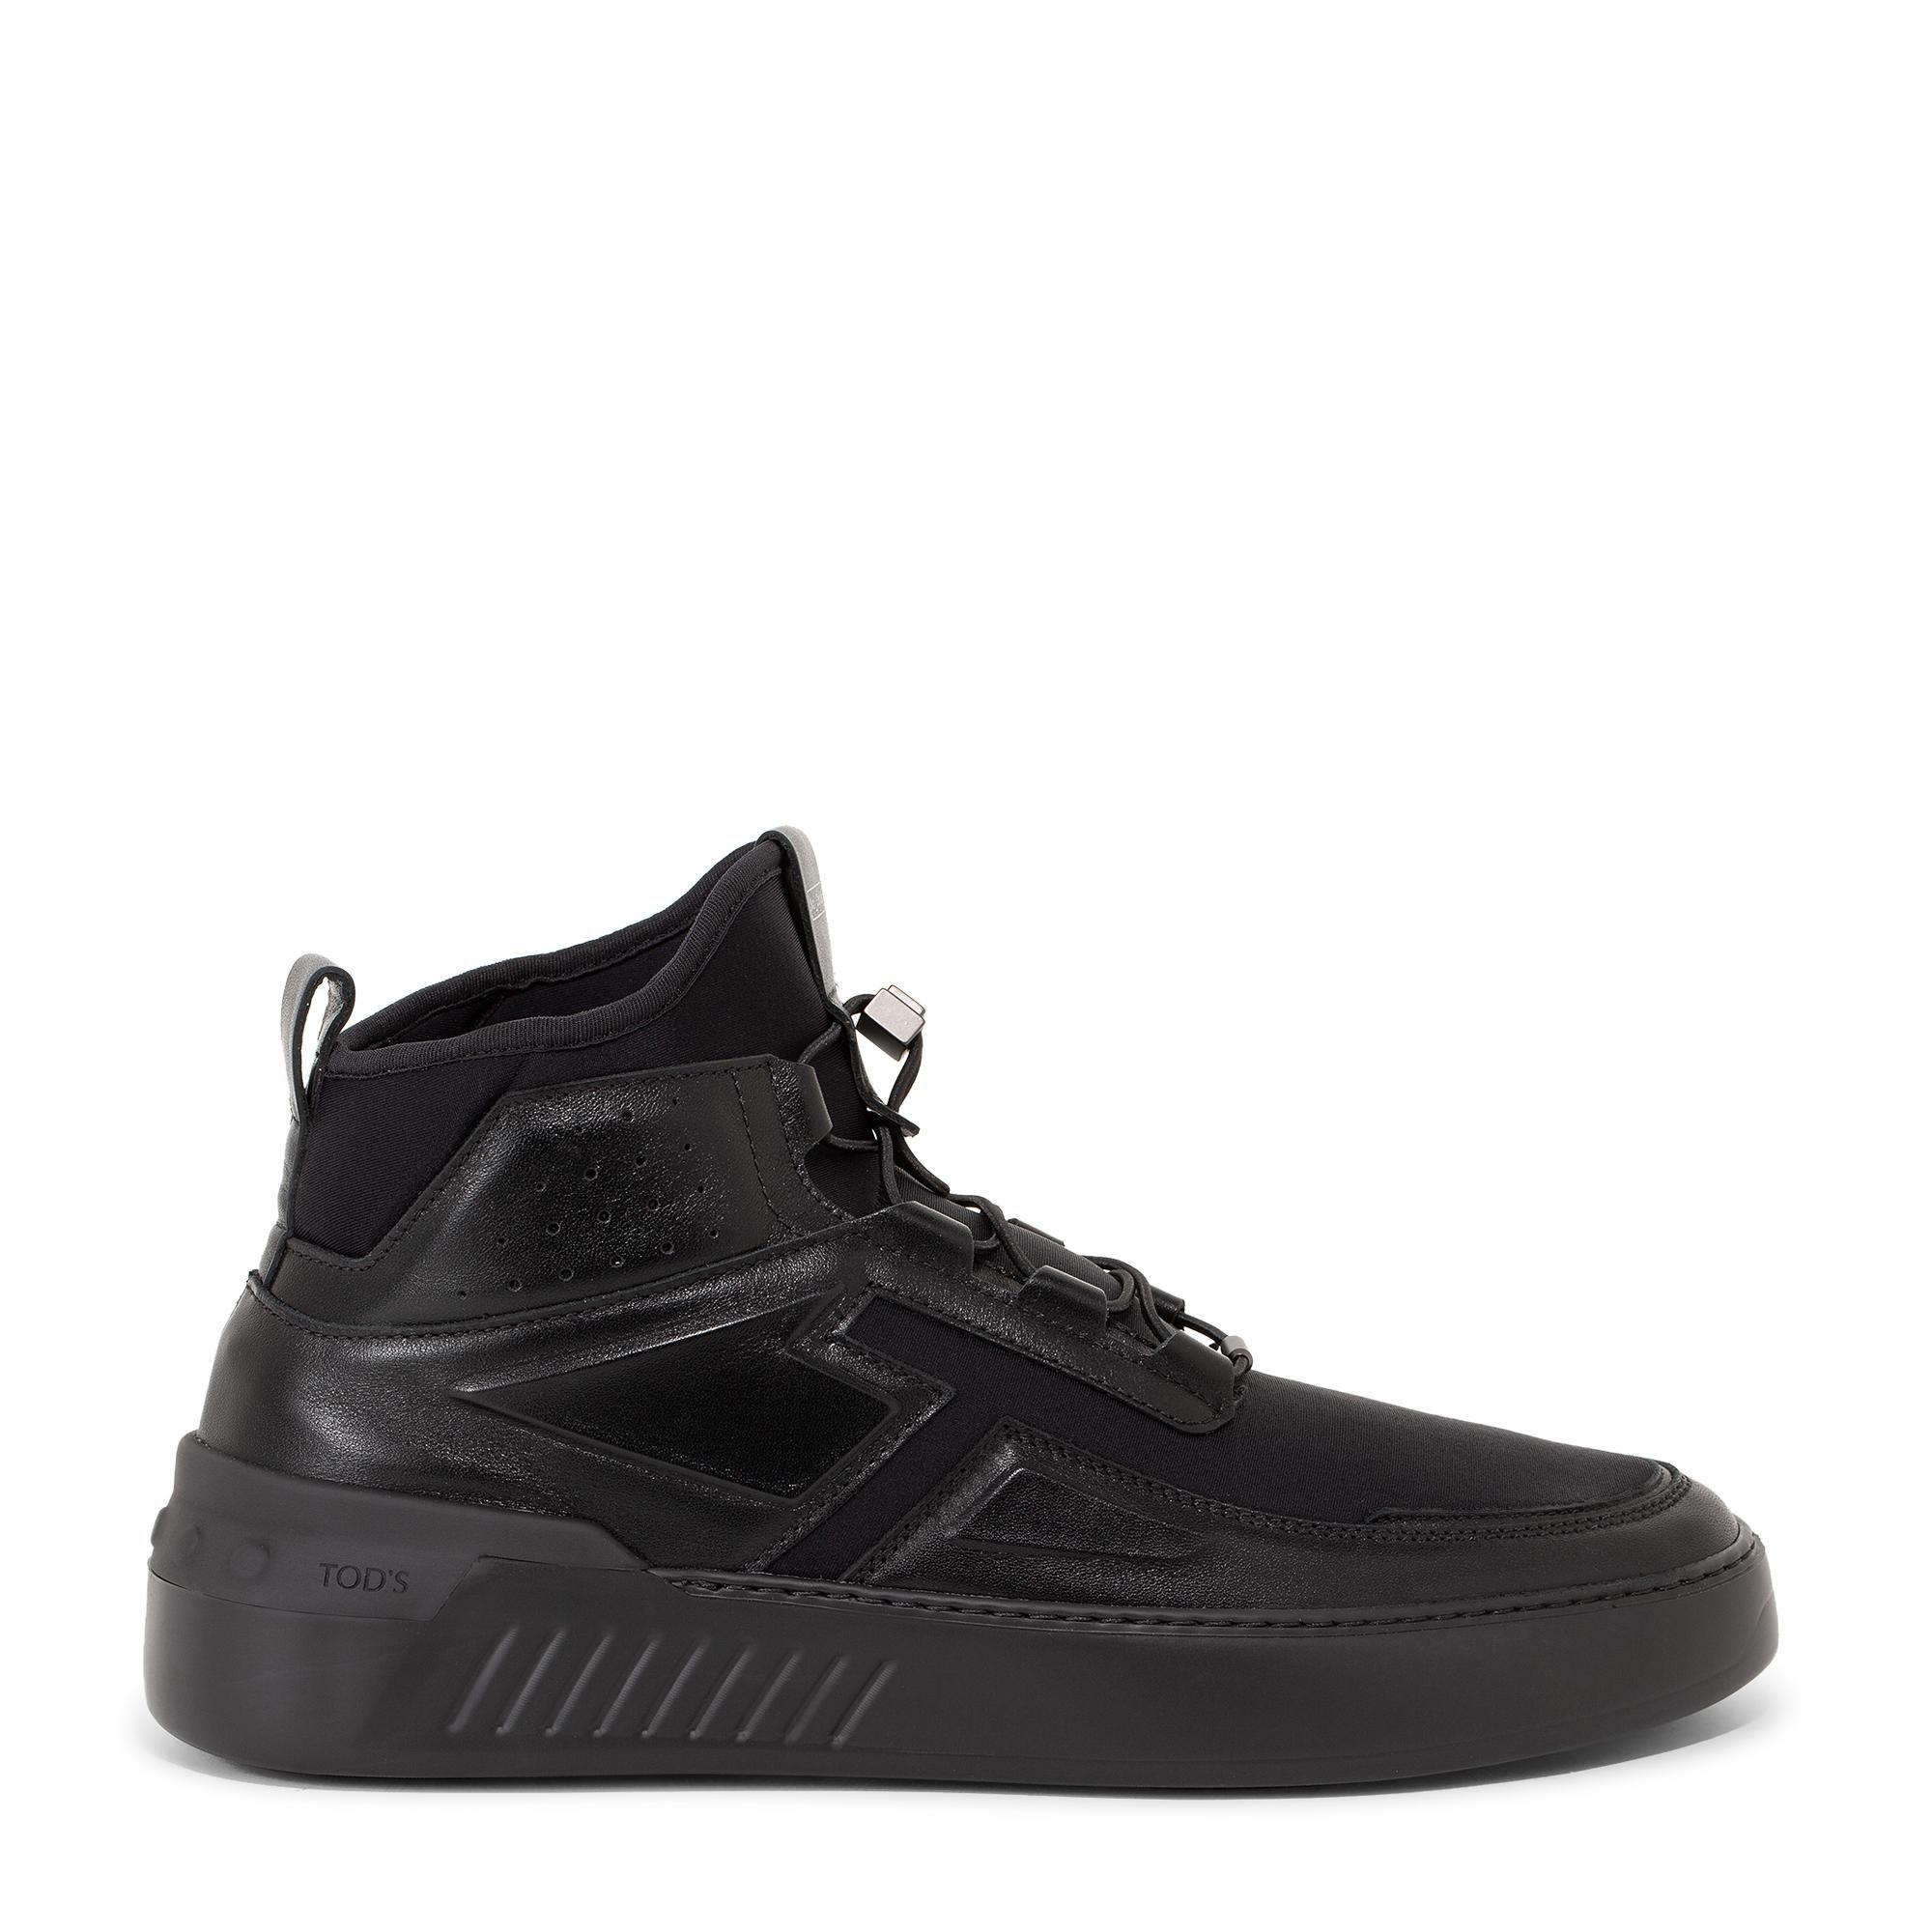 No_Code X high-top sneakers